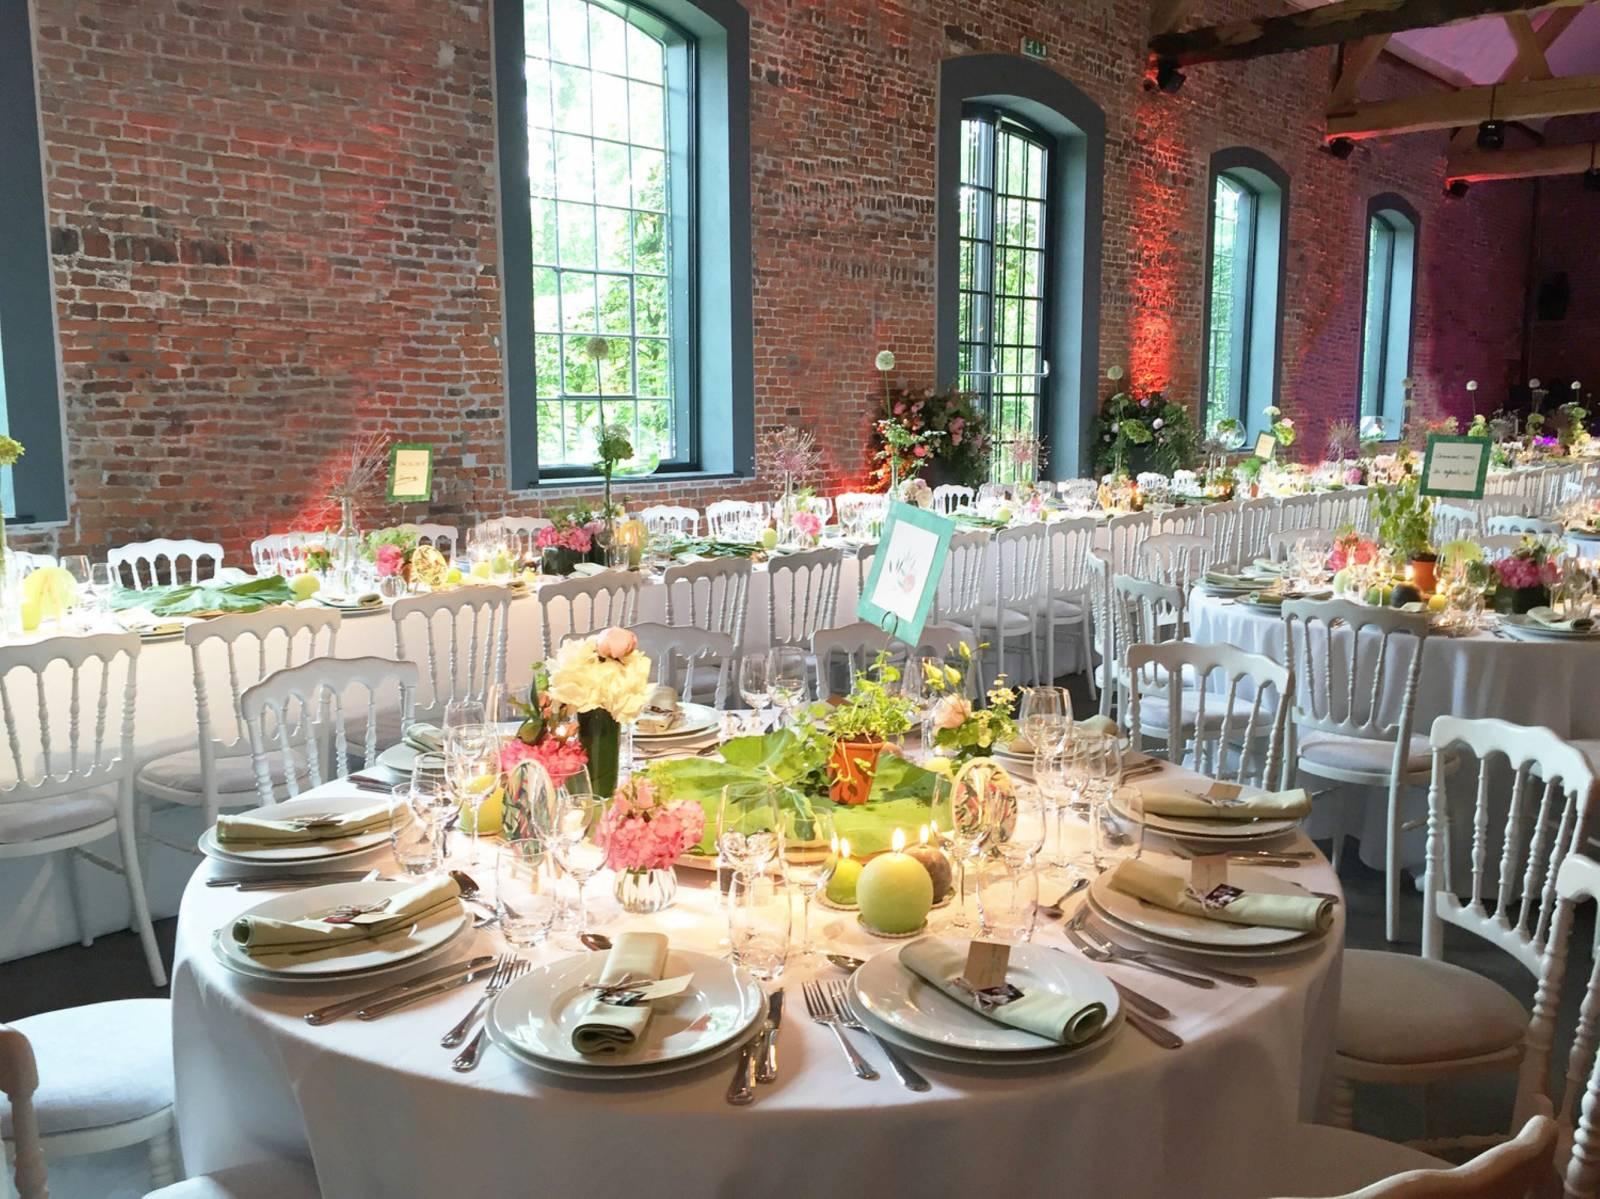 La ferme de Balingue House of Weddings feestzaal salle de fete lieu exceptionnel huwelijk mariage trouwen trouwzaal Brusse (19)